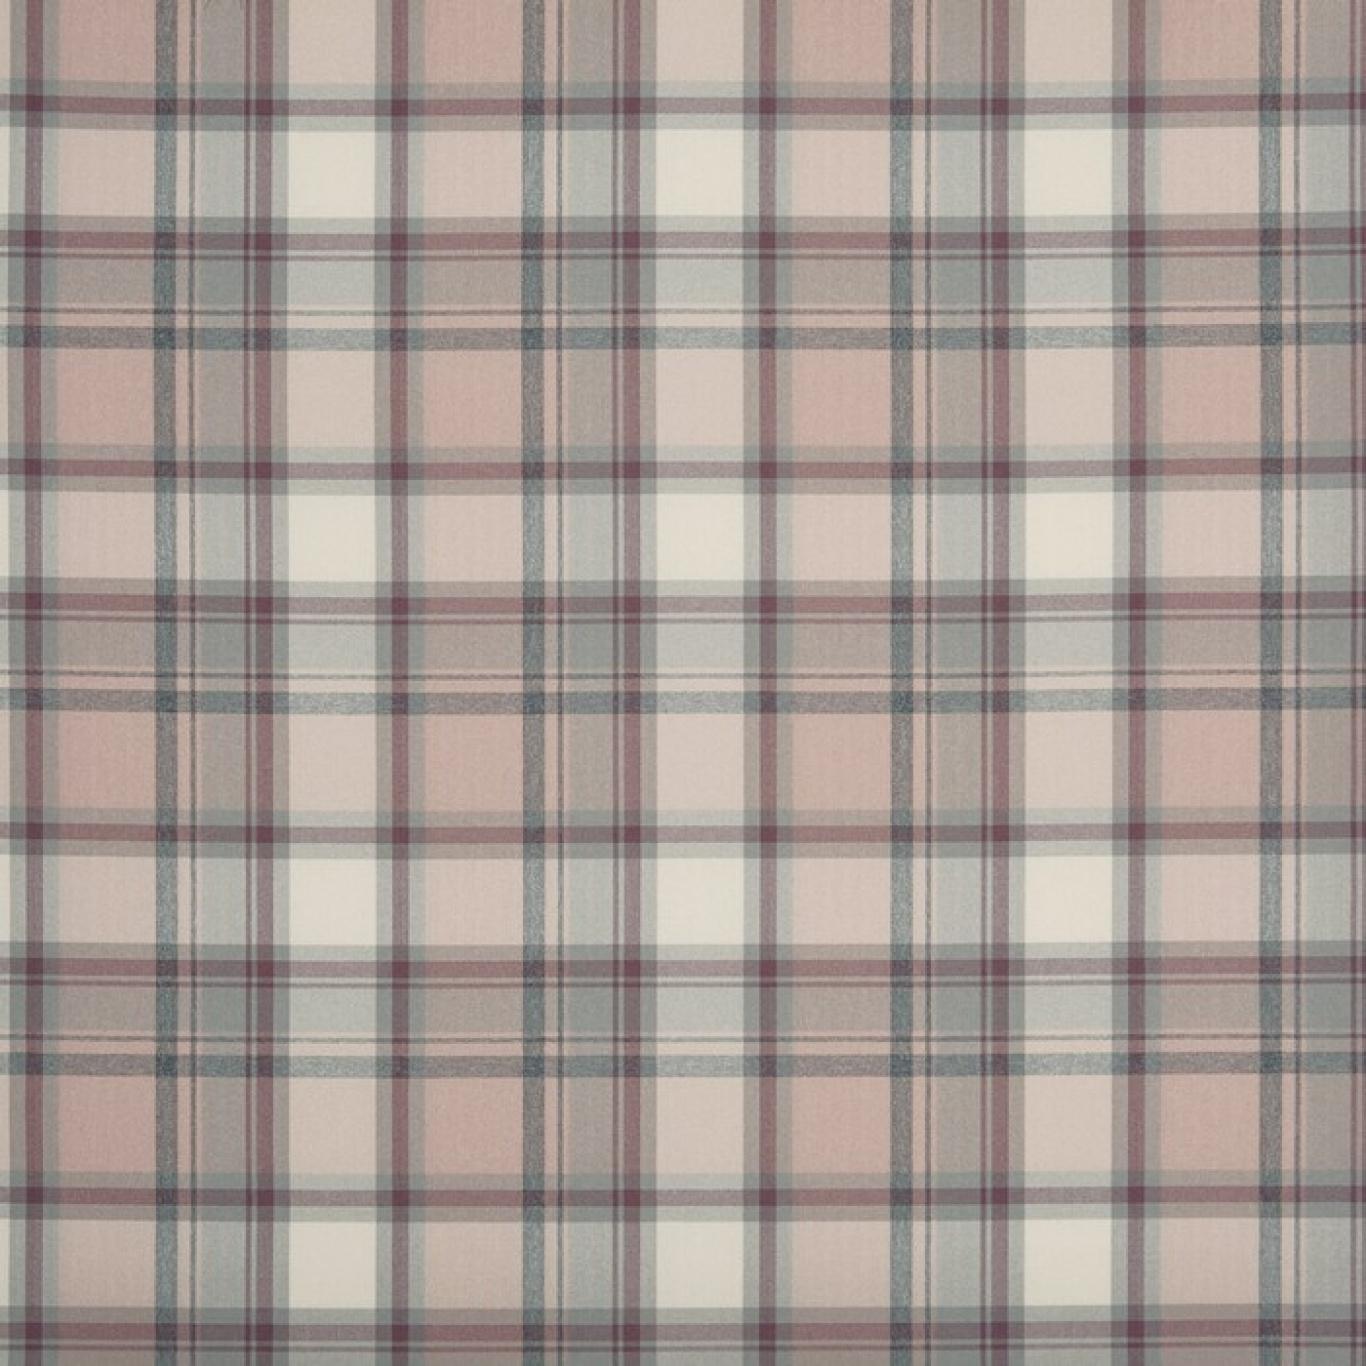 Image of Prestigious Belmont Thistle FR Fabric 2016/995